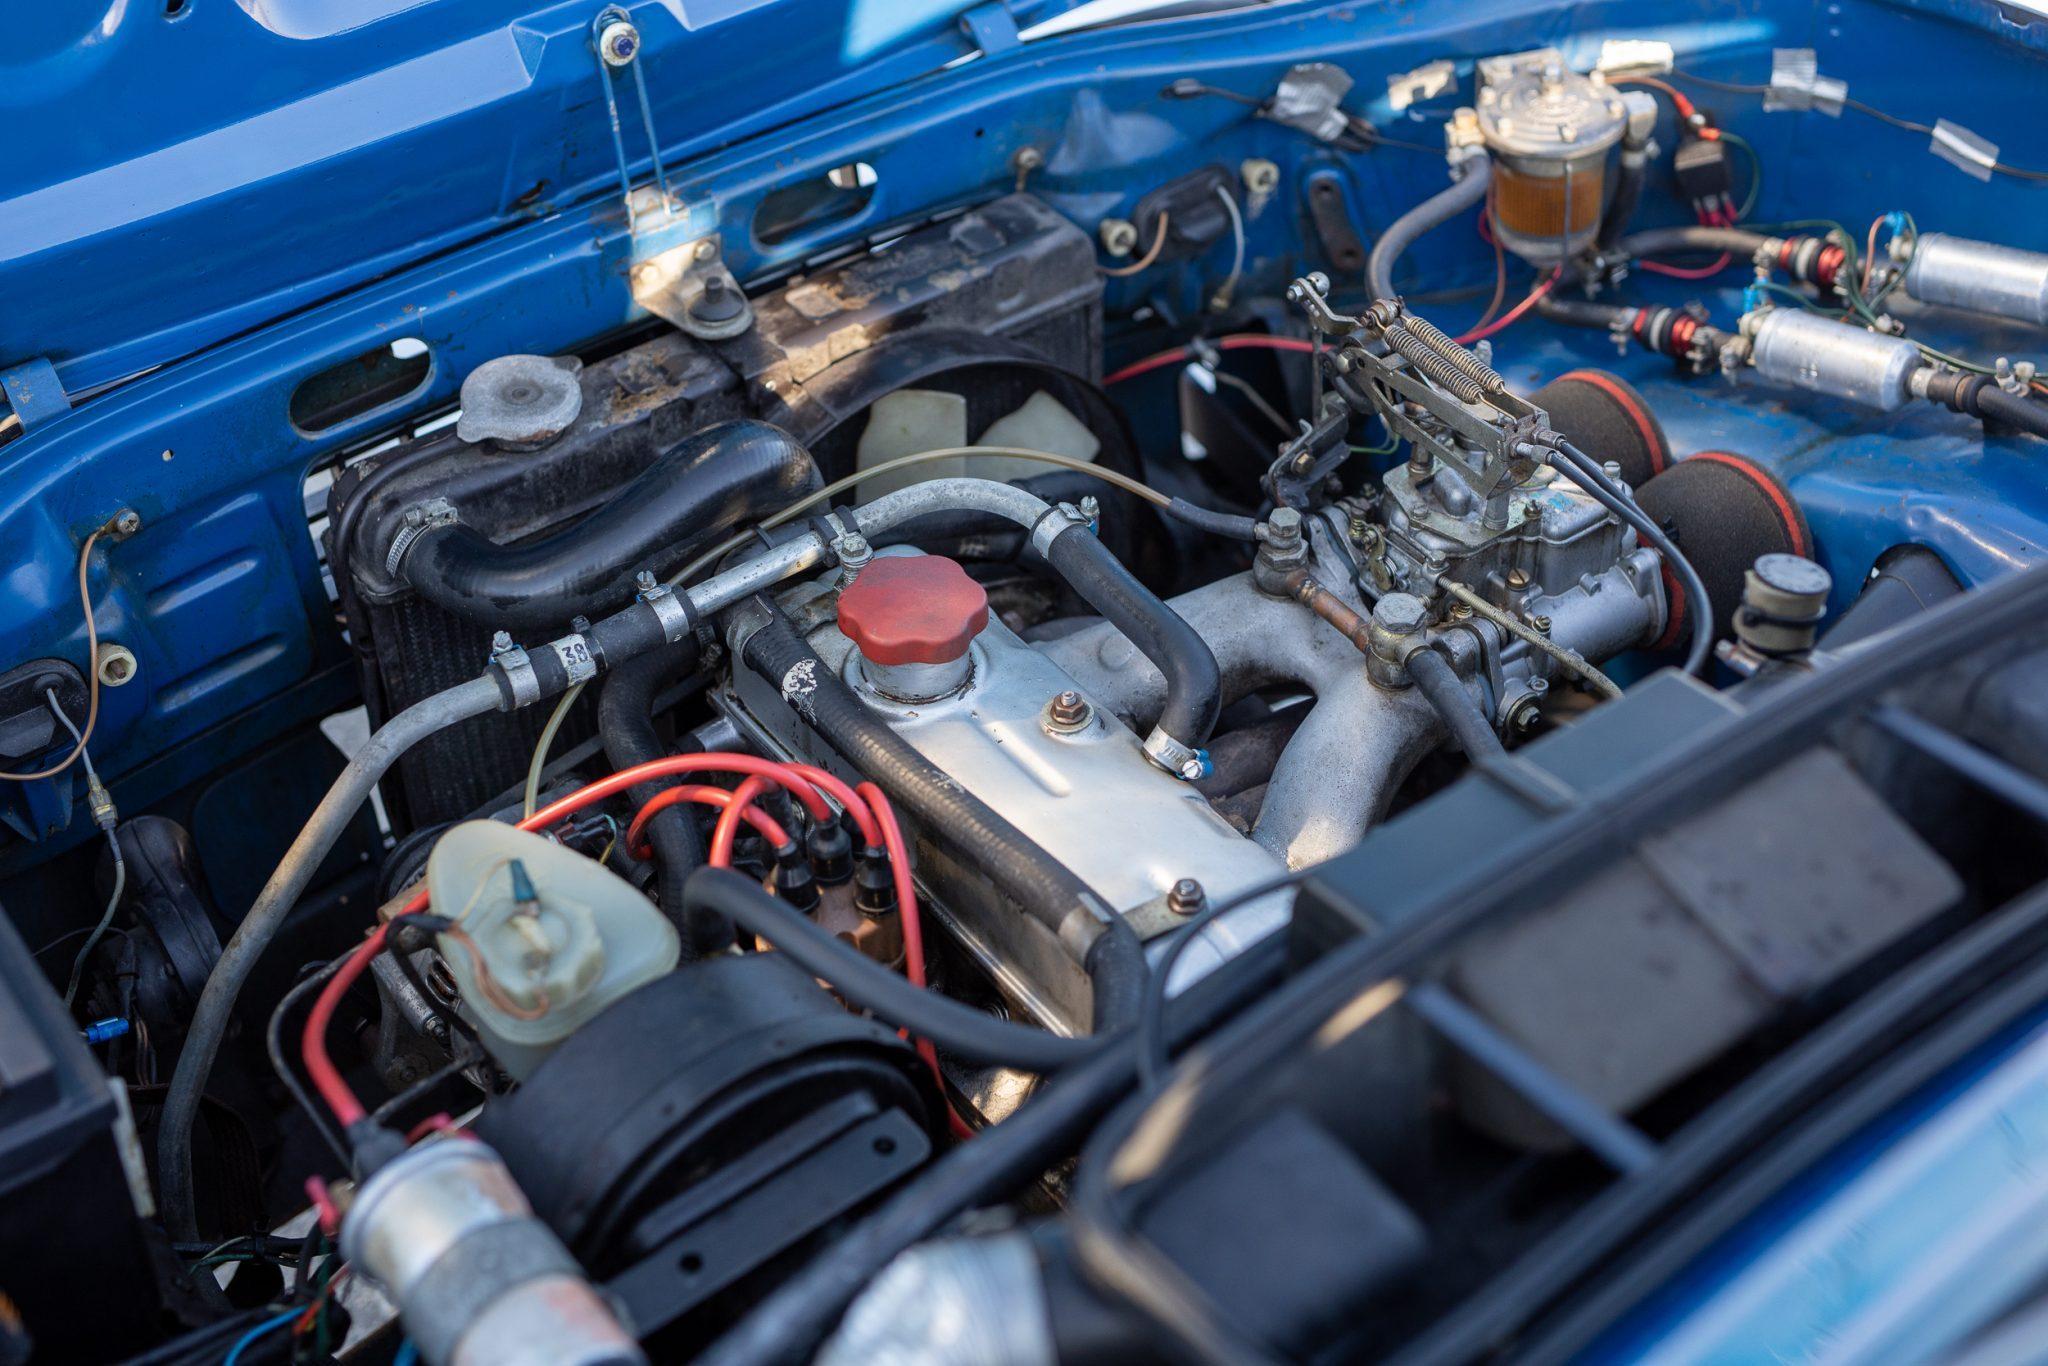 1975 DAF 66 Marathon Coupe Rally Car engine